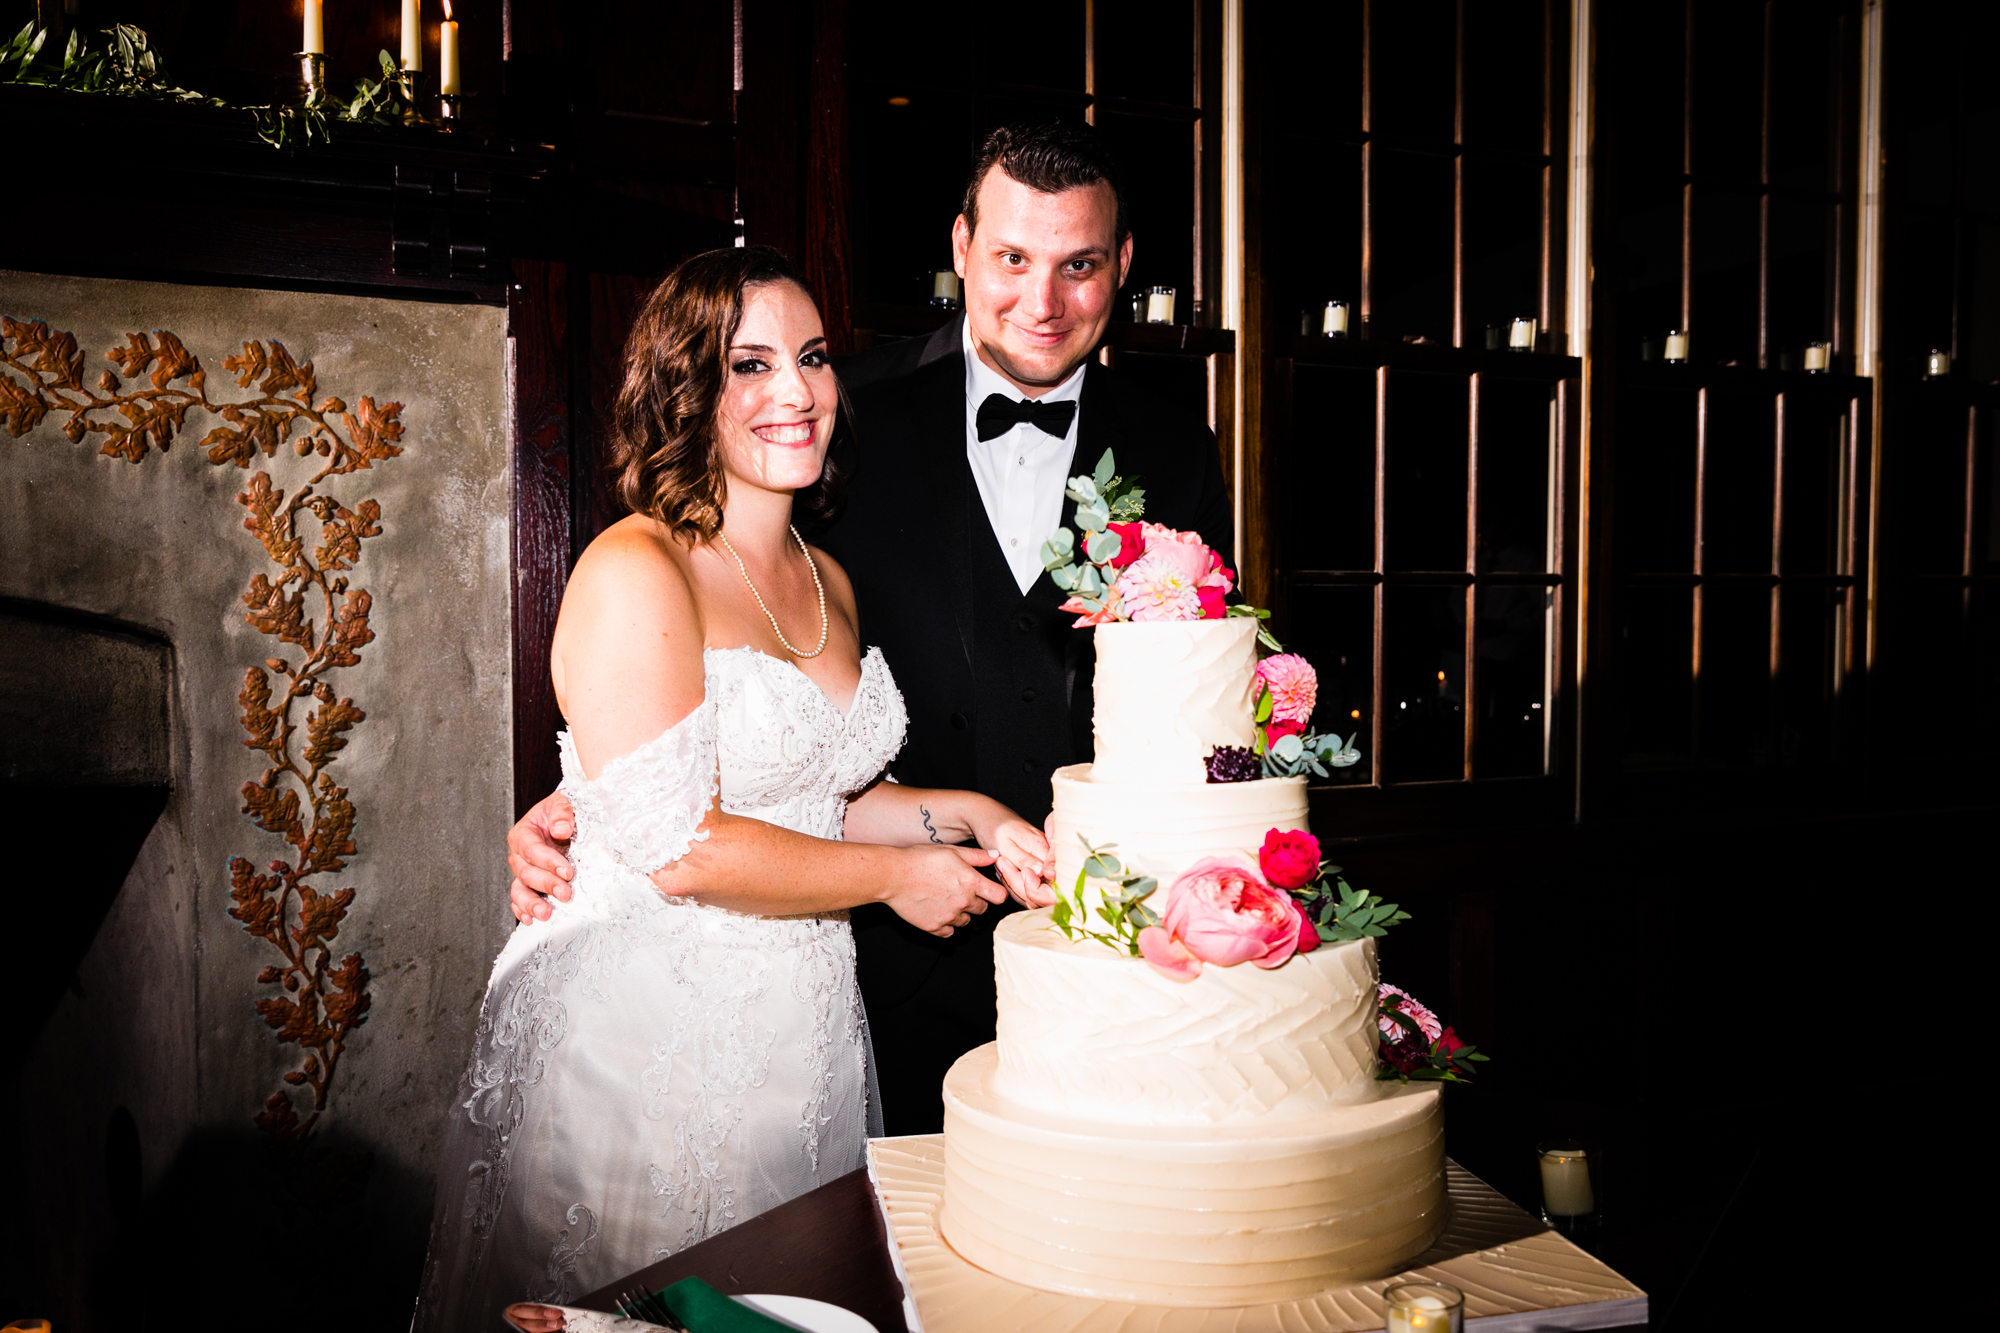 Hotel Du Village - LoveStruck Pictures - Wedding Photography-110.jpg